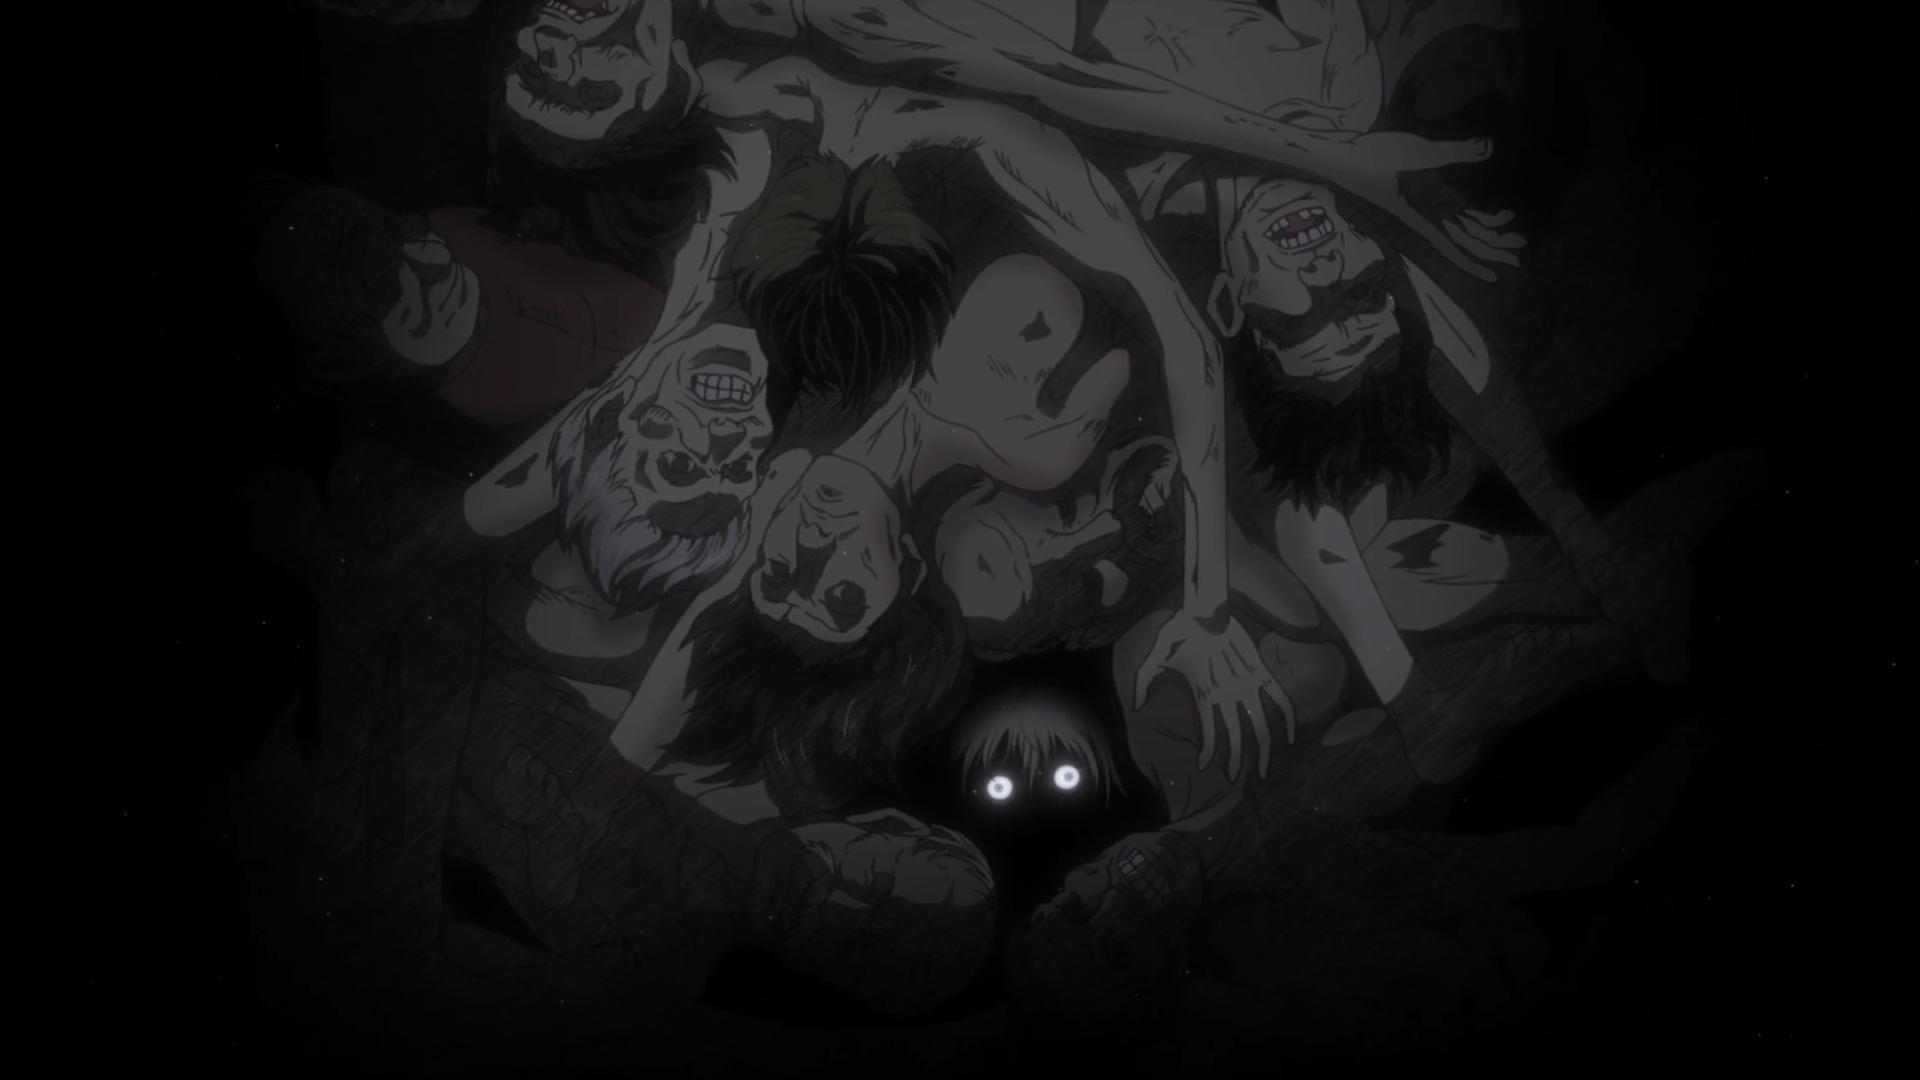 Bodies Surrounding The Egg